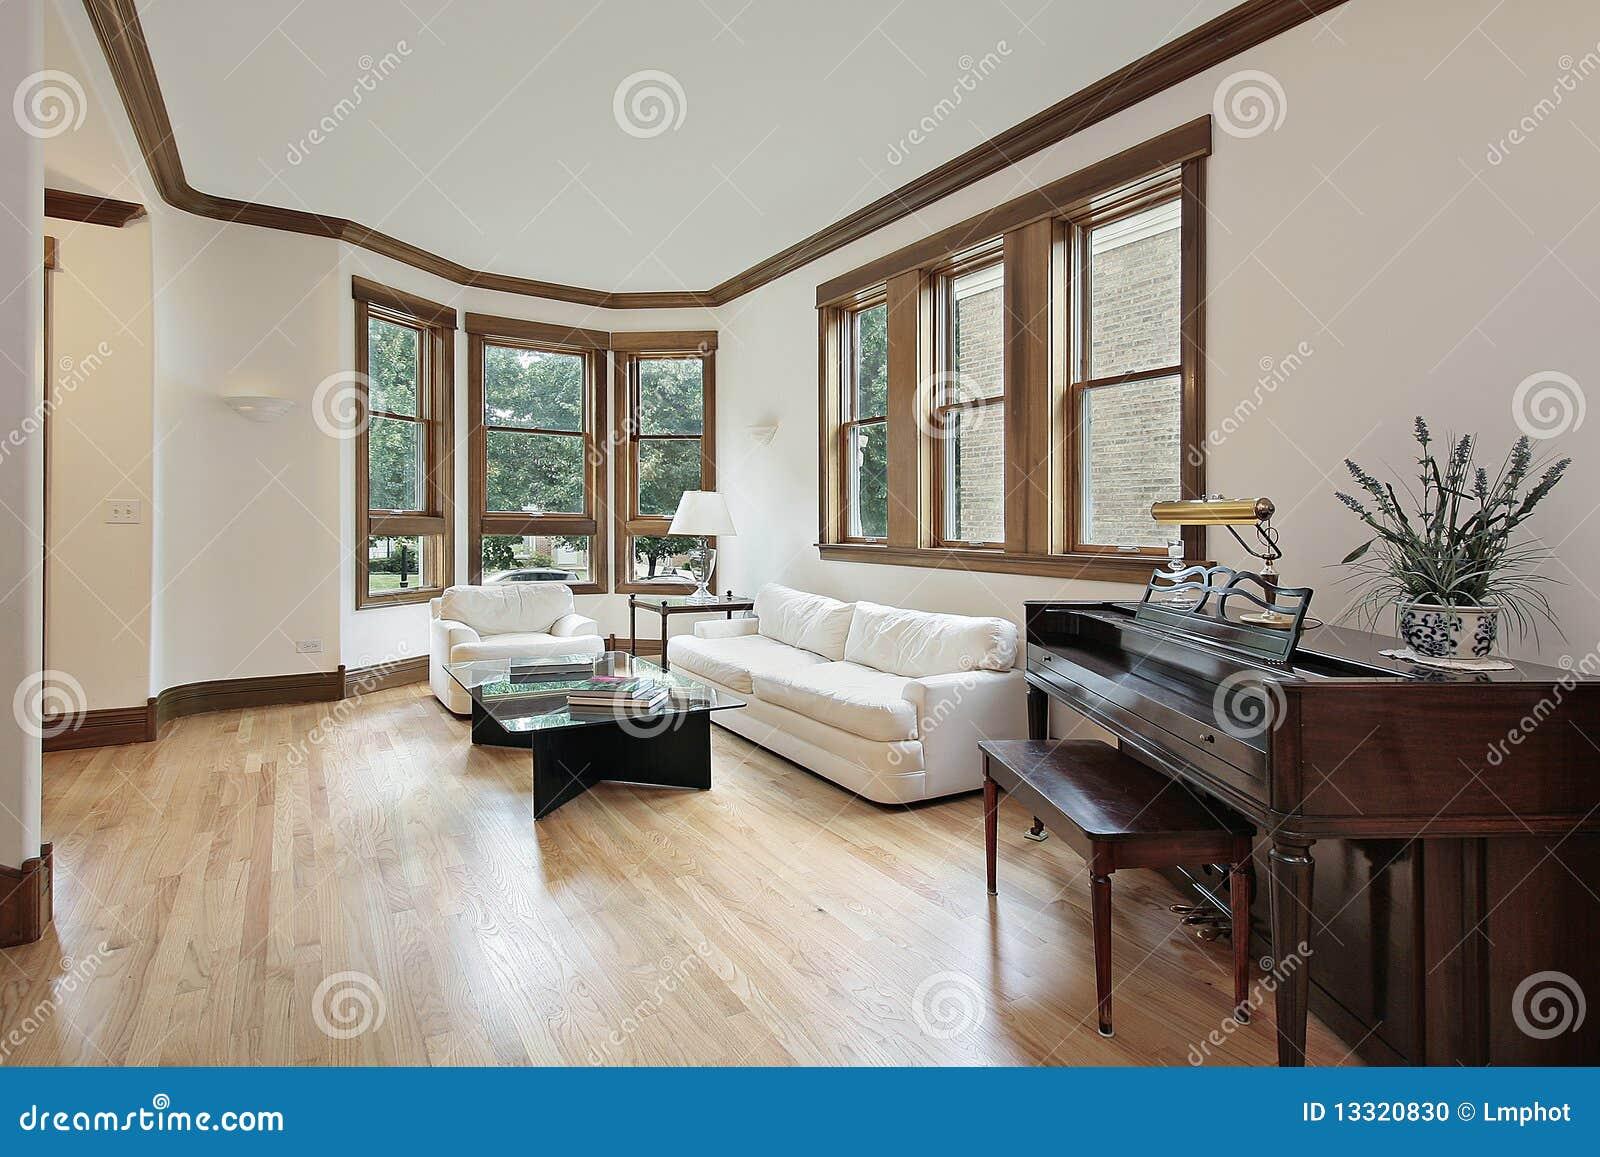 Hout In Woonkamer : Muurdecoratie woonkamer hout luxury vers verzameling de